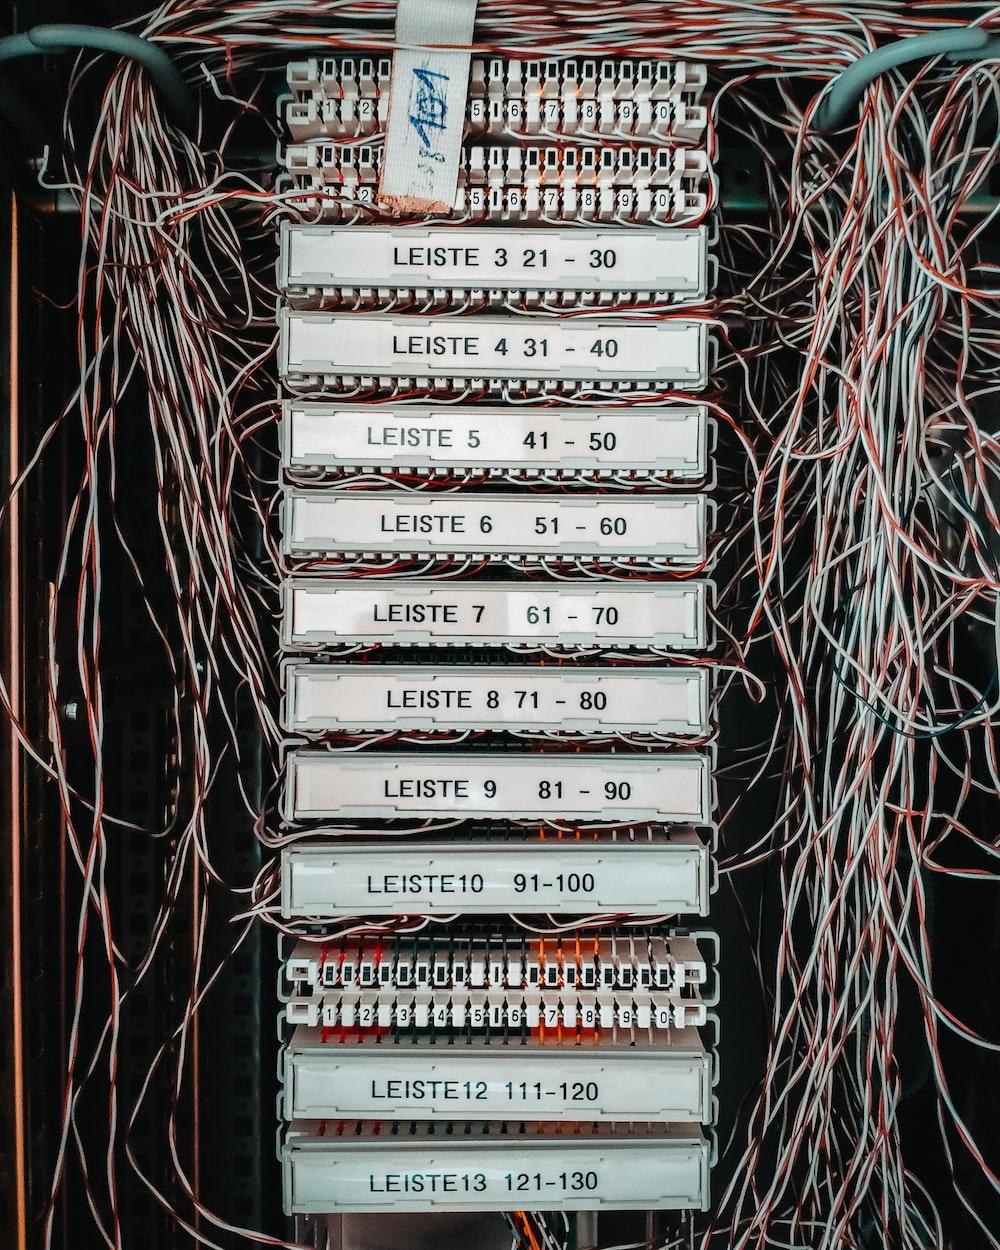 multicolored coated wire